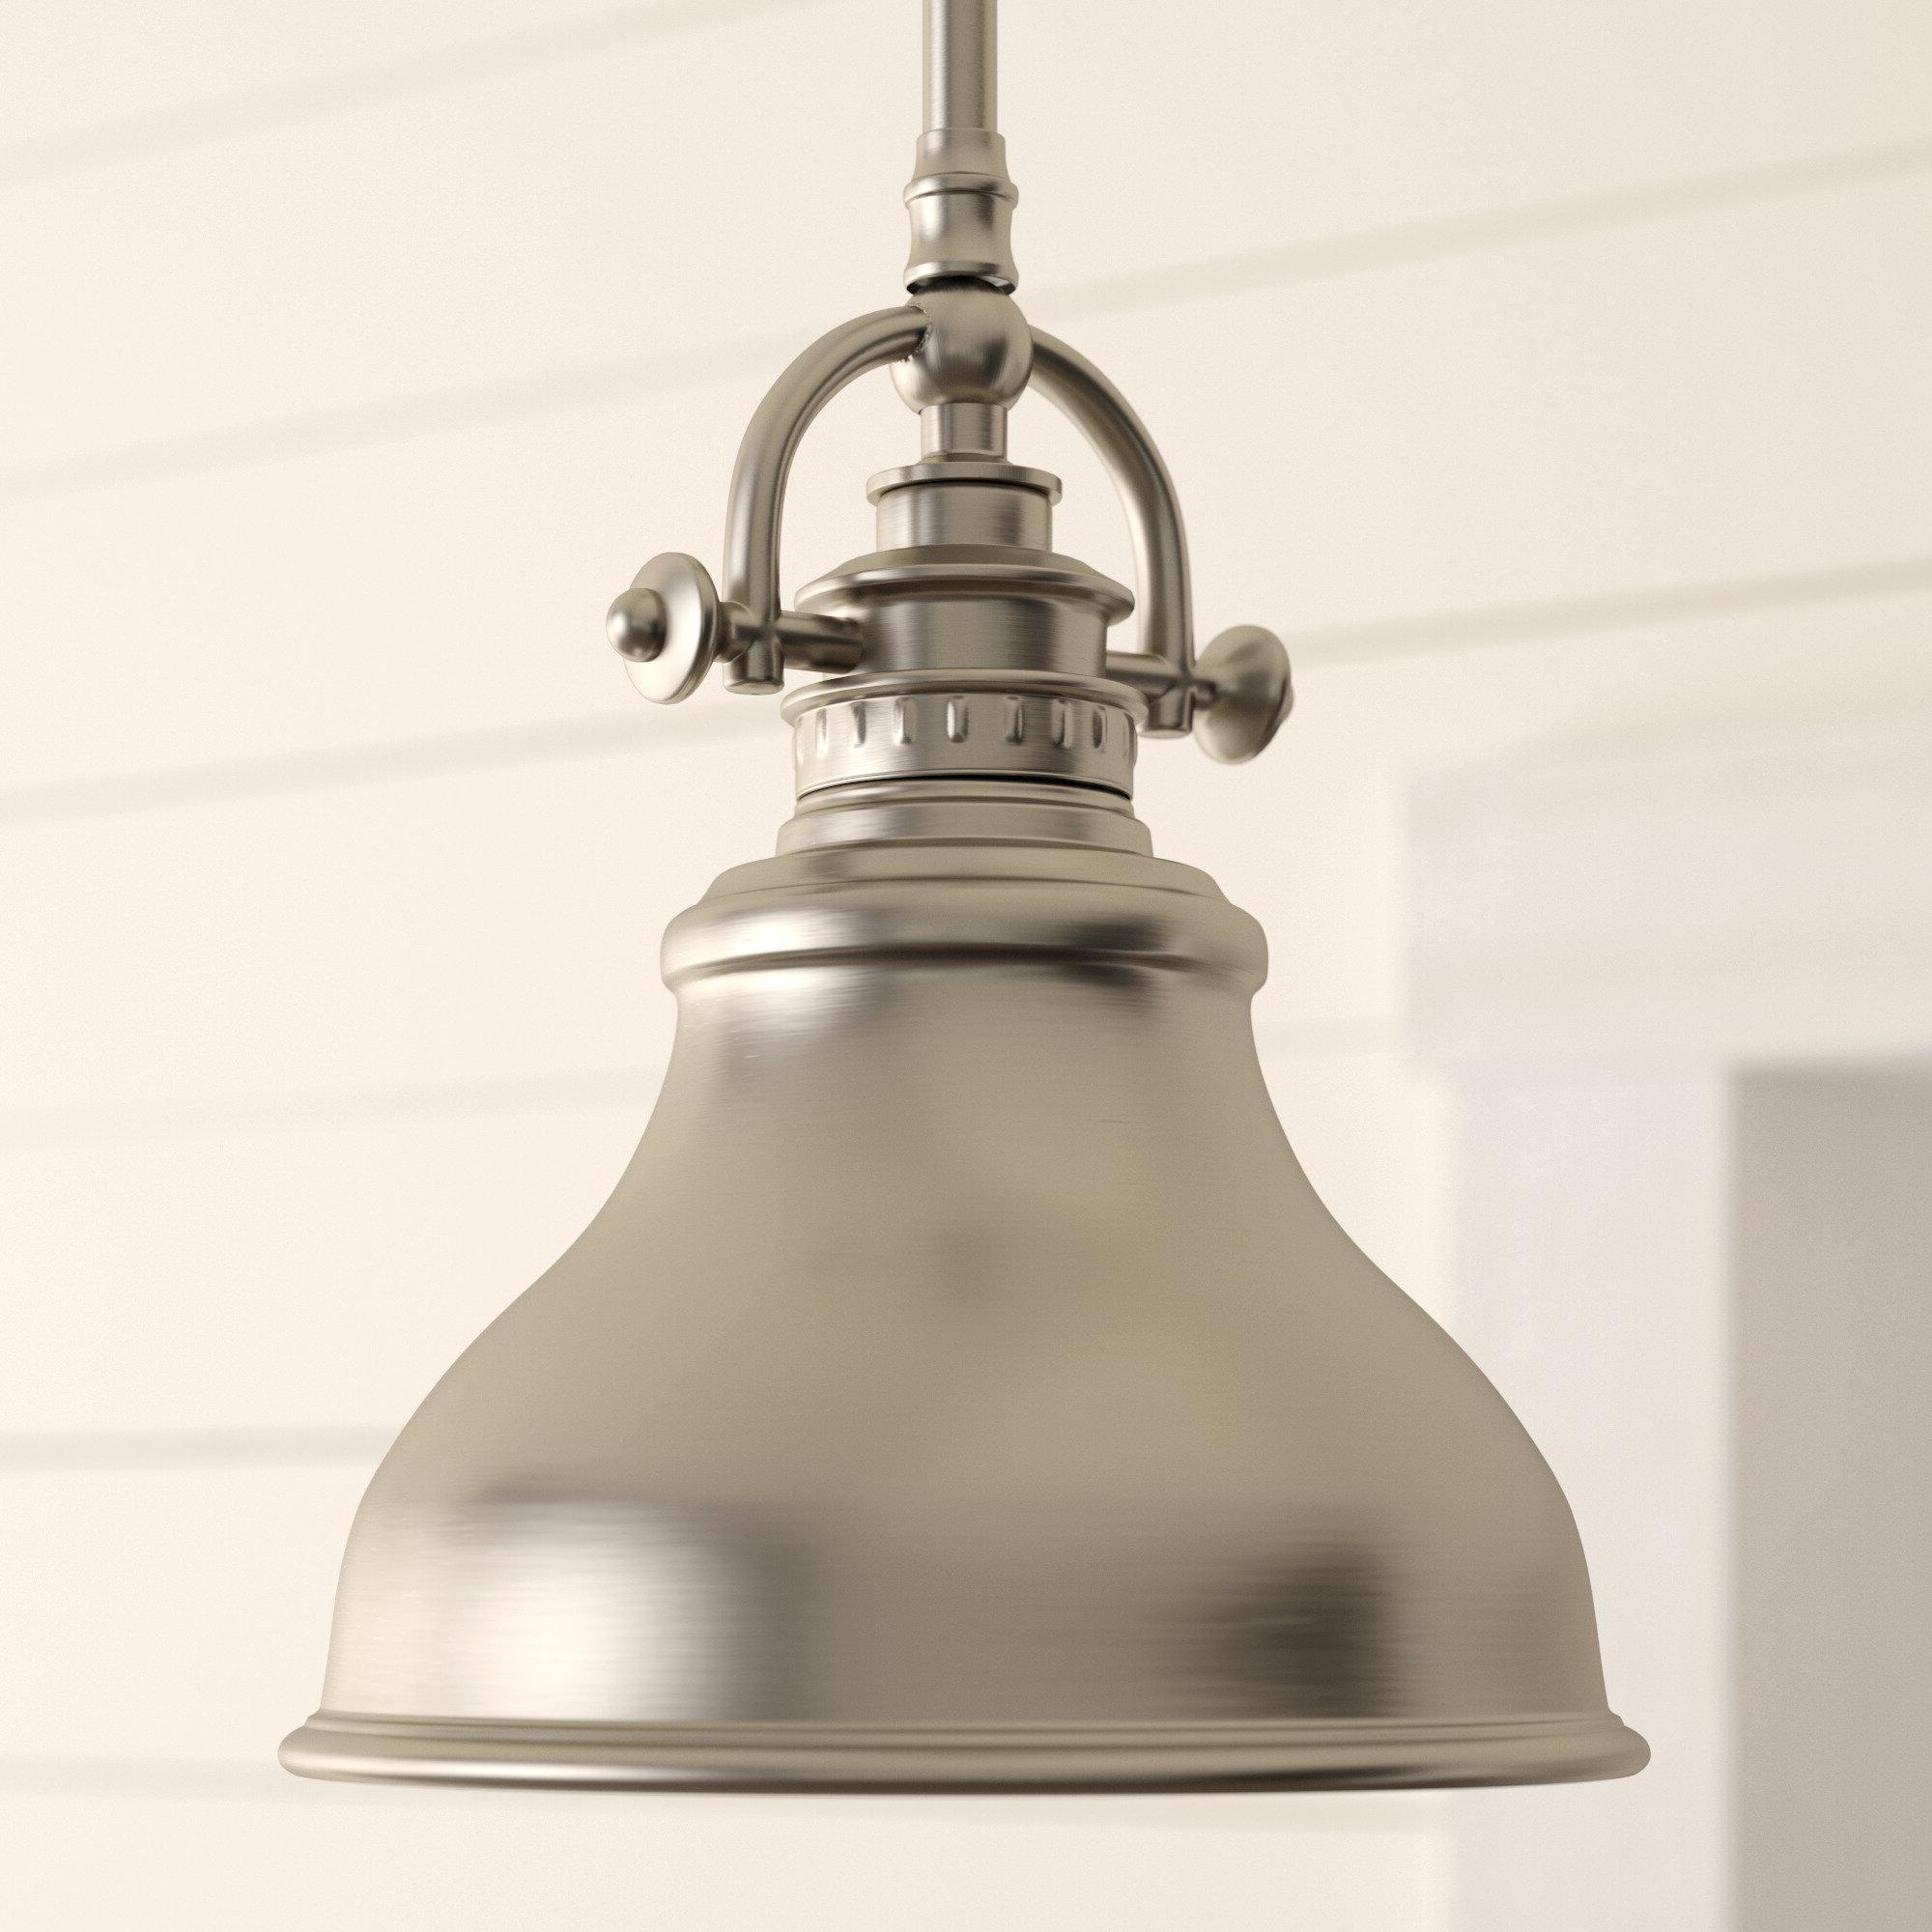 2019 Hamilton 1 Light Single Dome Pendants Throughout Beachcrest Home Mueller 1 Light Single Dome Pendant (Gallery 4 of 20)